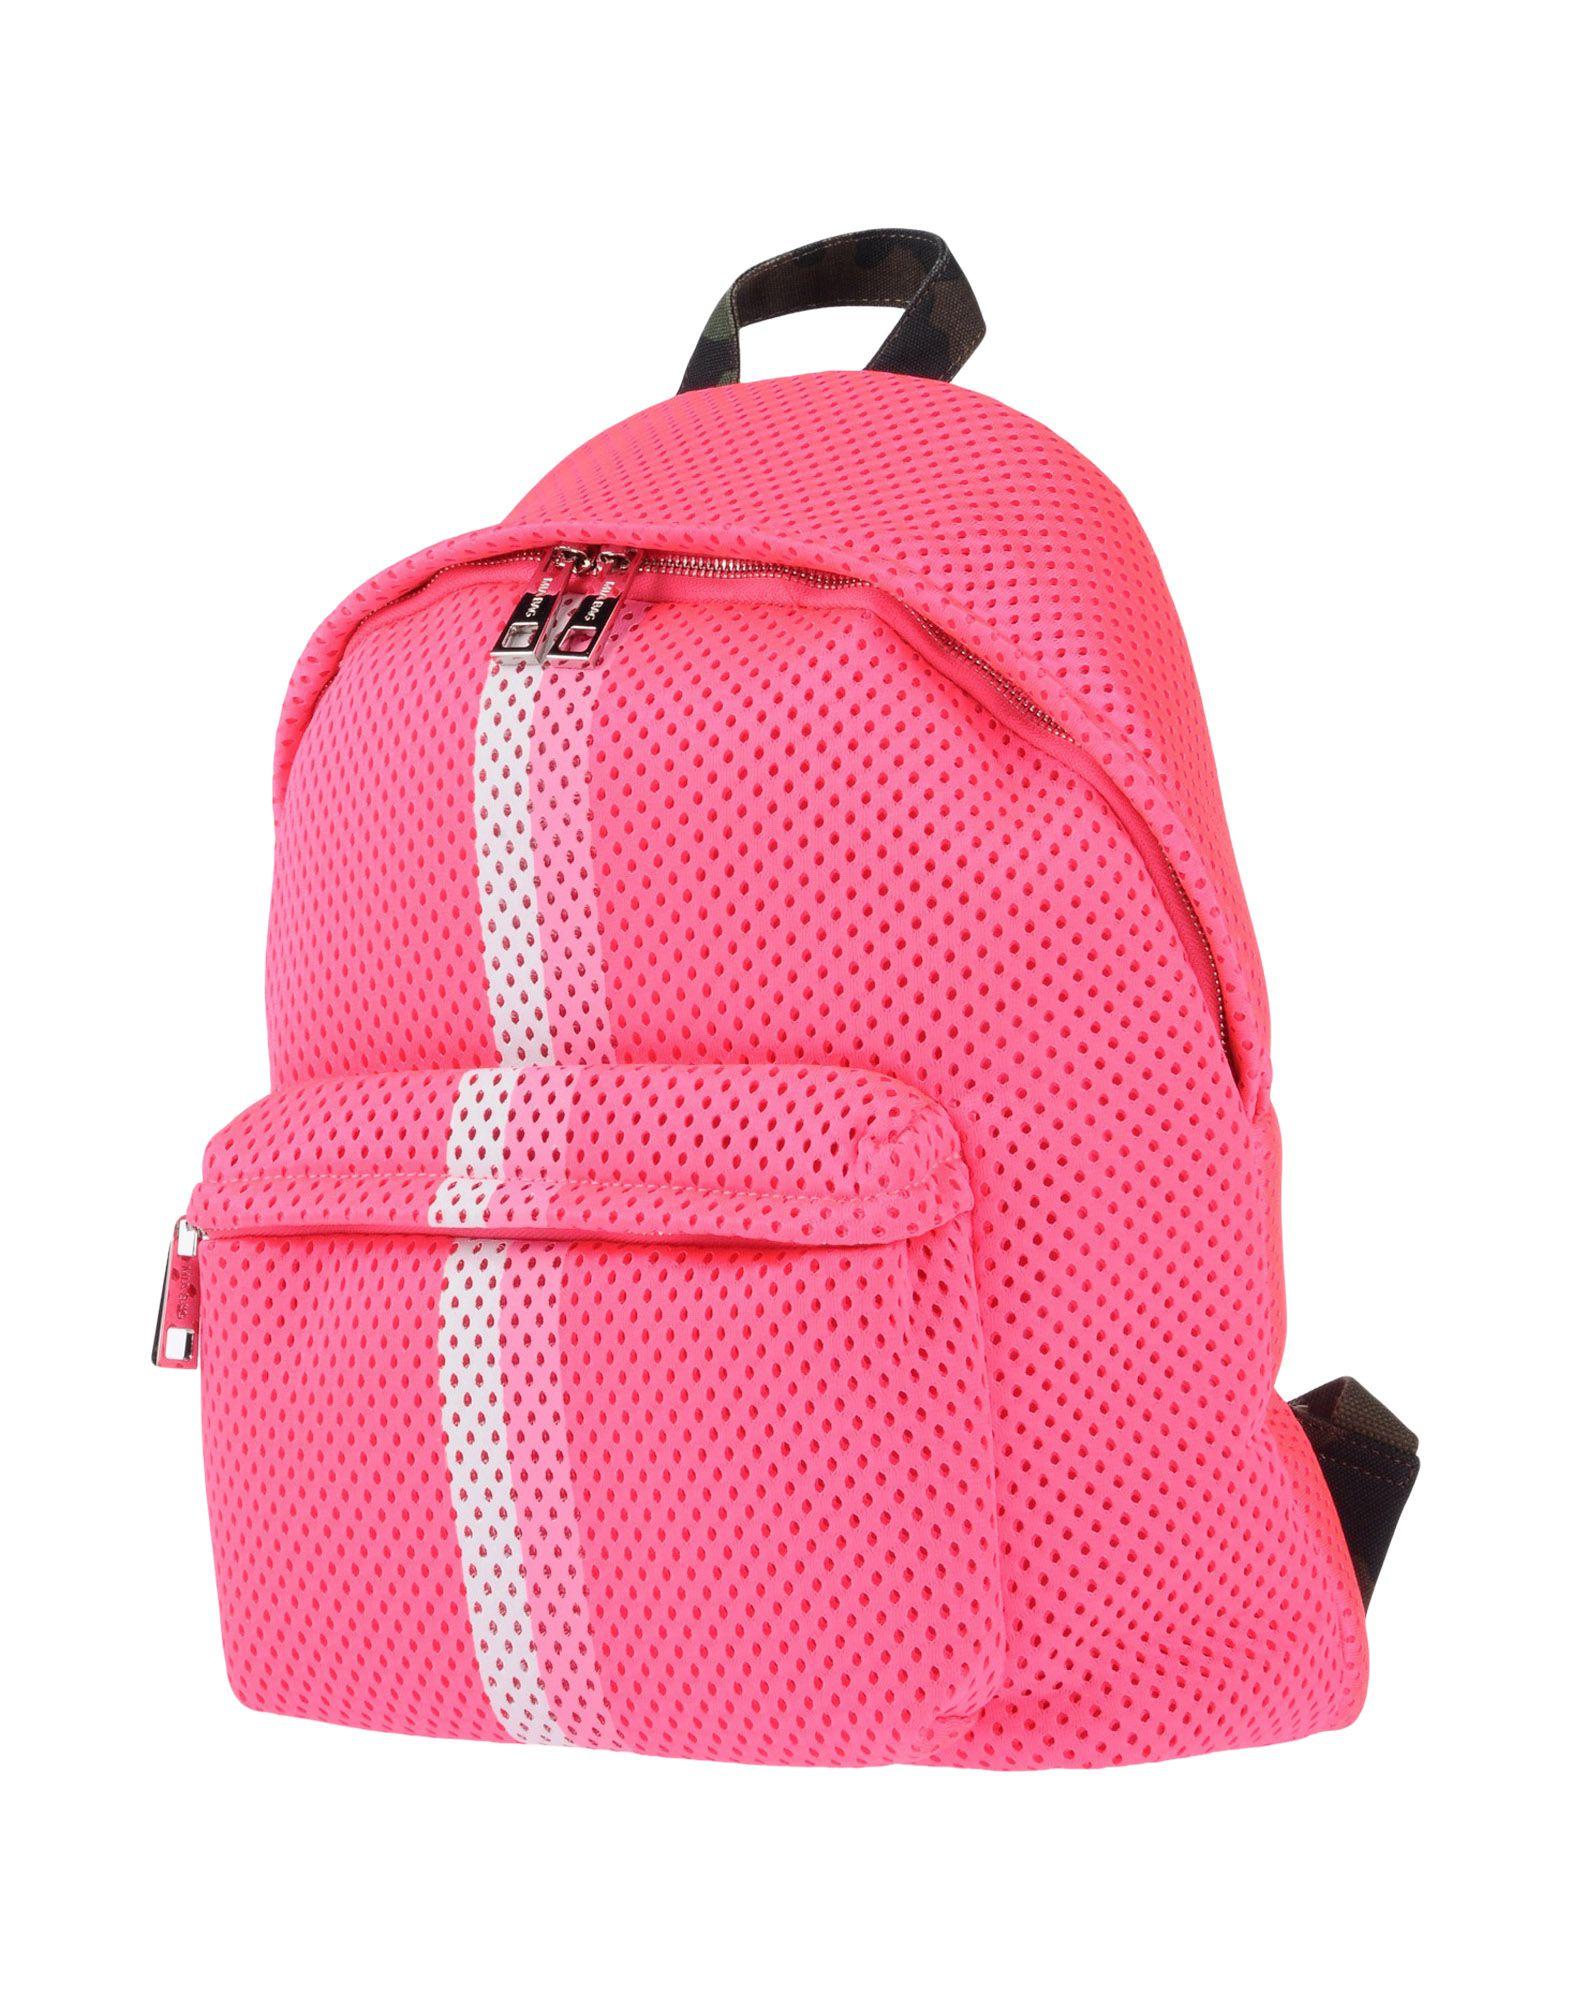 MIA BAG Рюкзаки и сумки на пояс makeup organizer travel bag women cosmetic bags summer dumpling clutch women packages waterproof cosmetic bag handbag